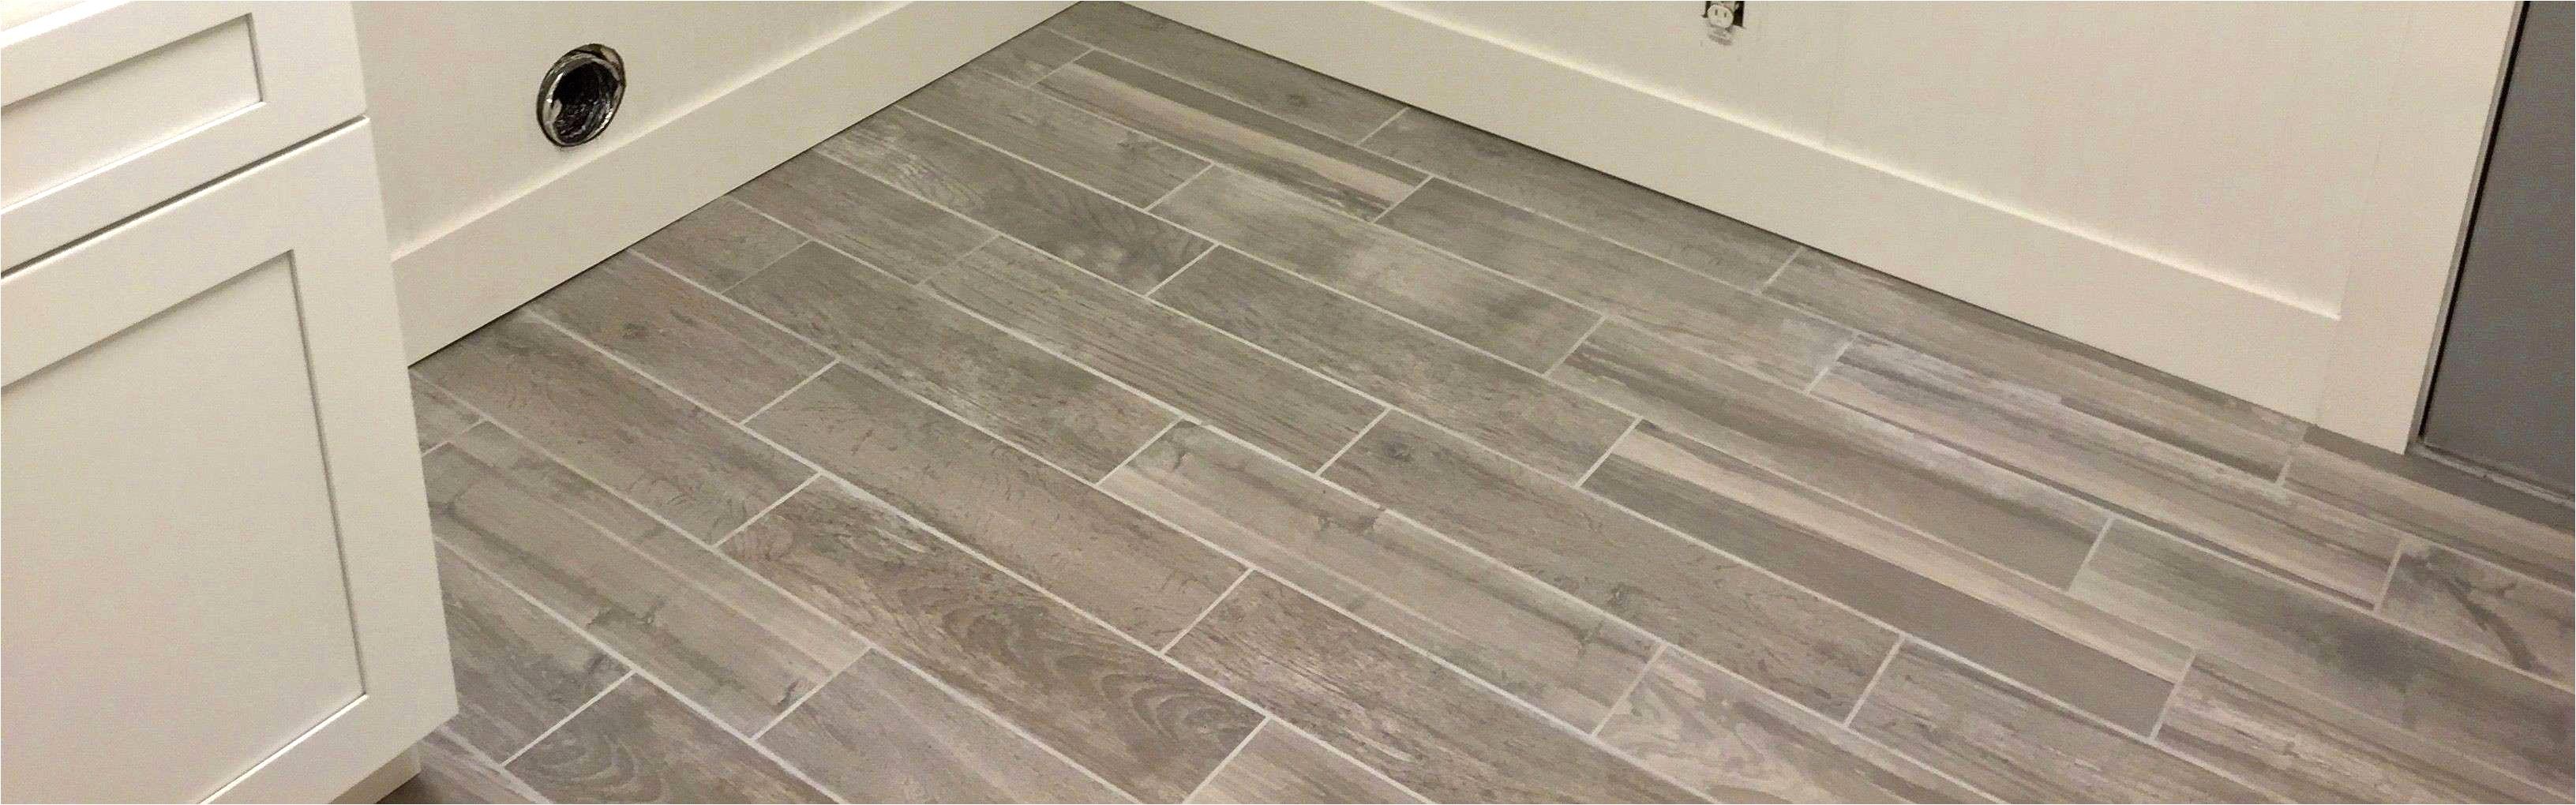 Wood Floor Removal Machine Removing Hardwood Floors 50 Beautiful